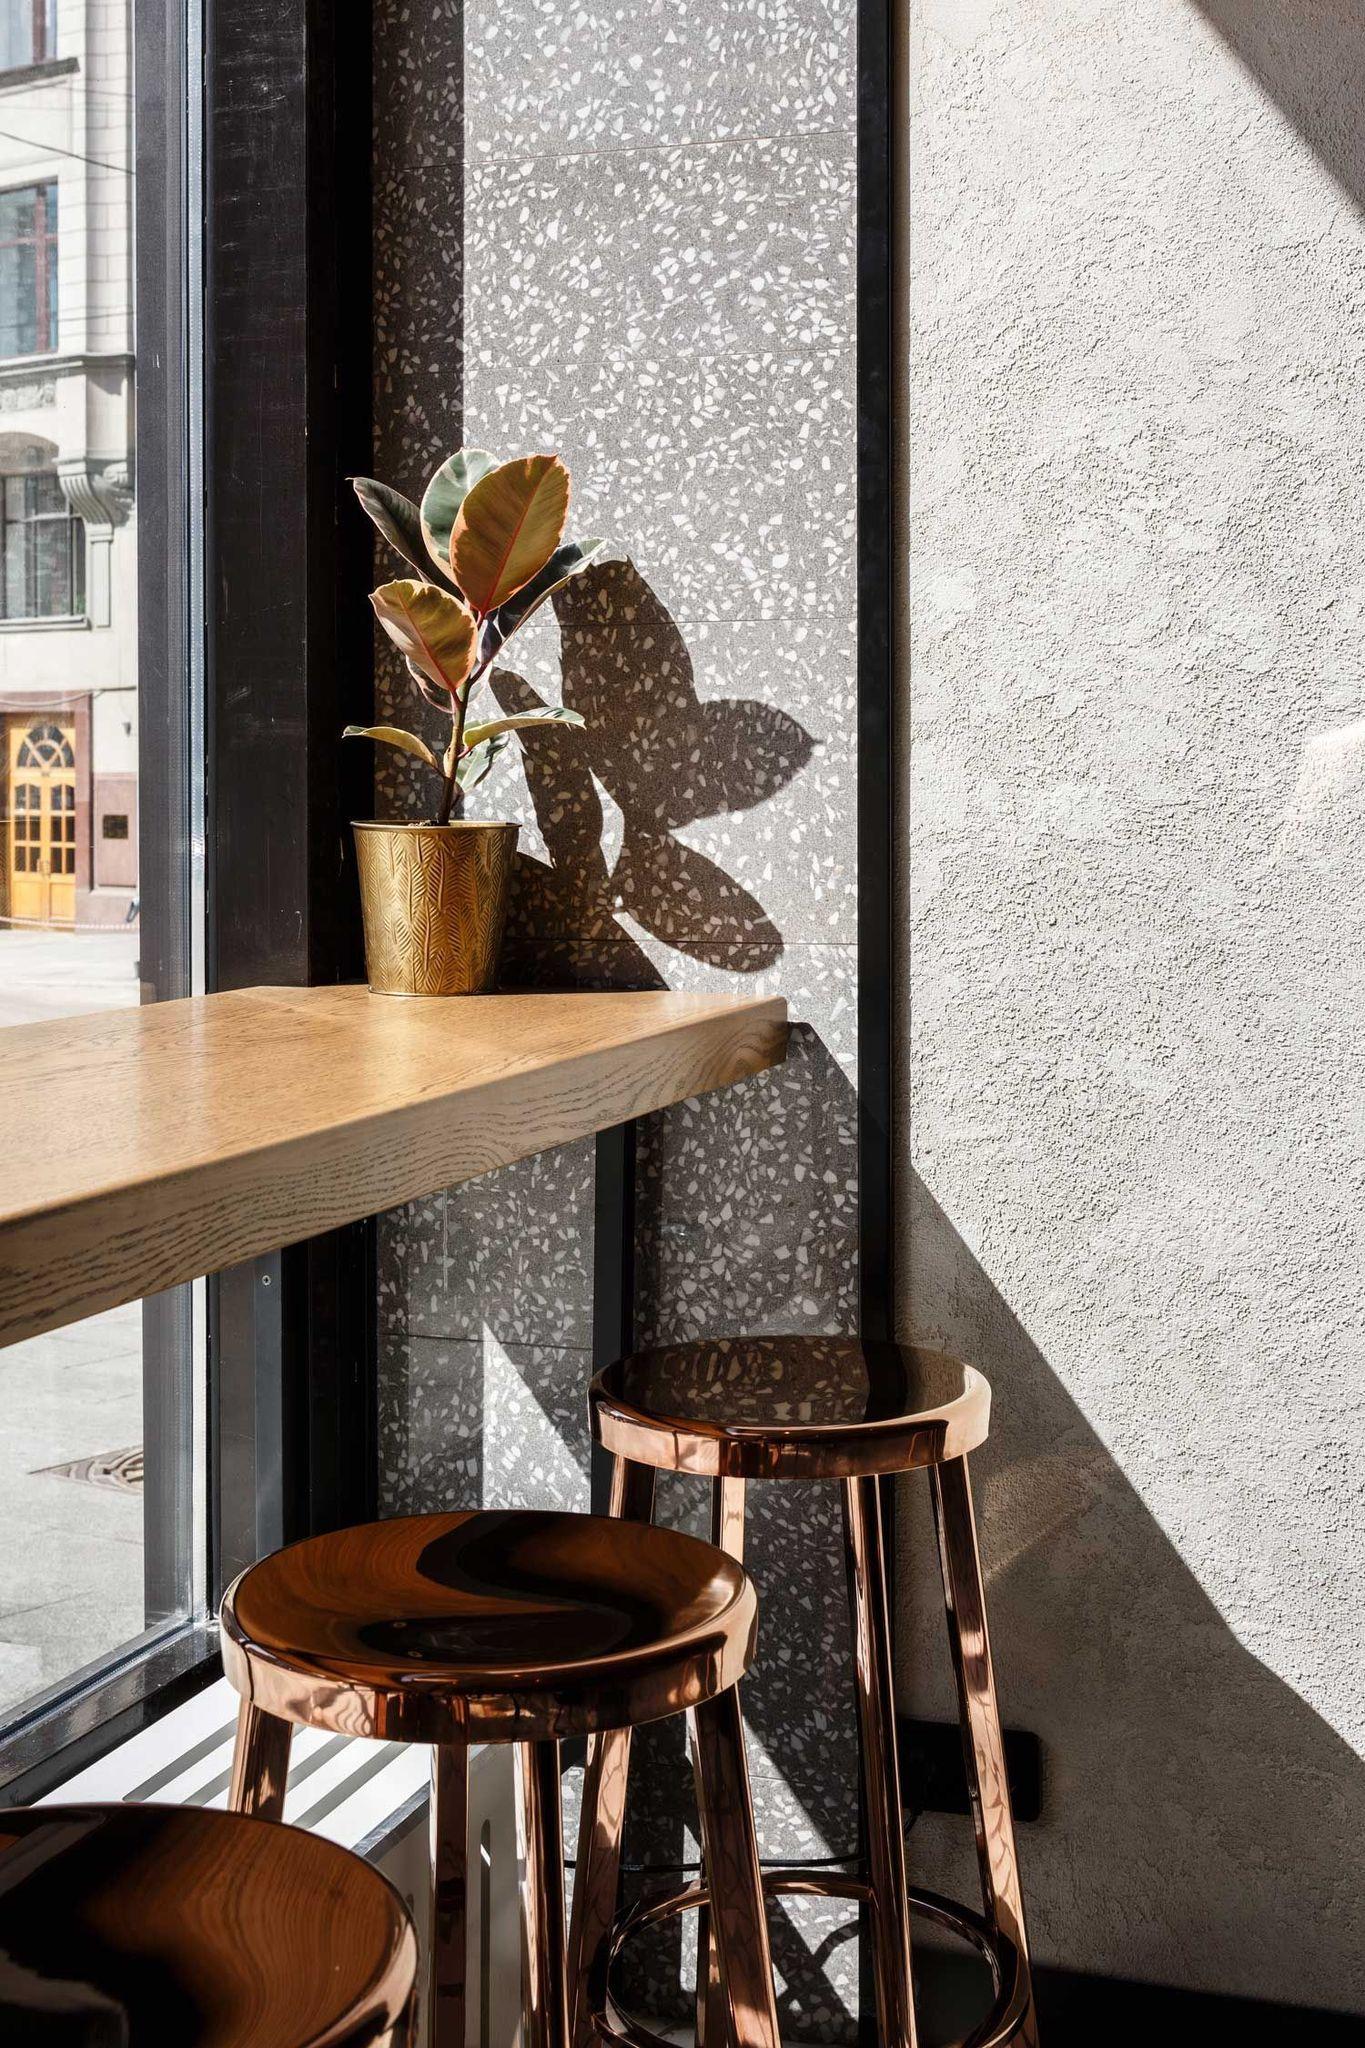 Copper Bar Stools Cafe Interior Coffee Shop Interior Design